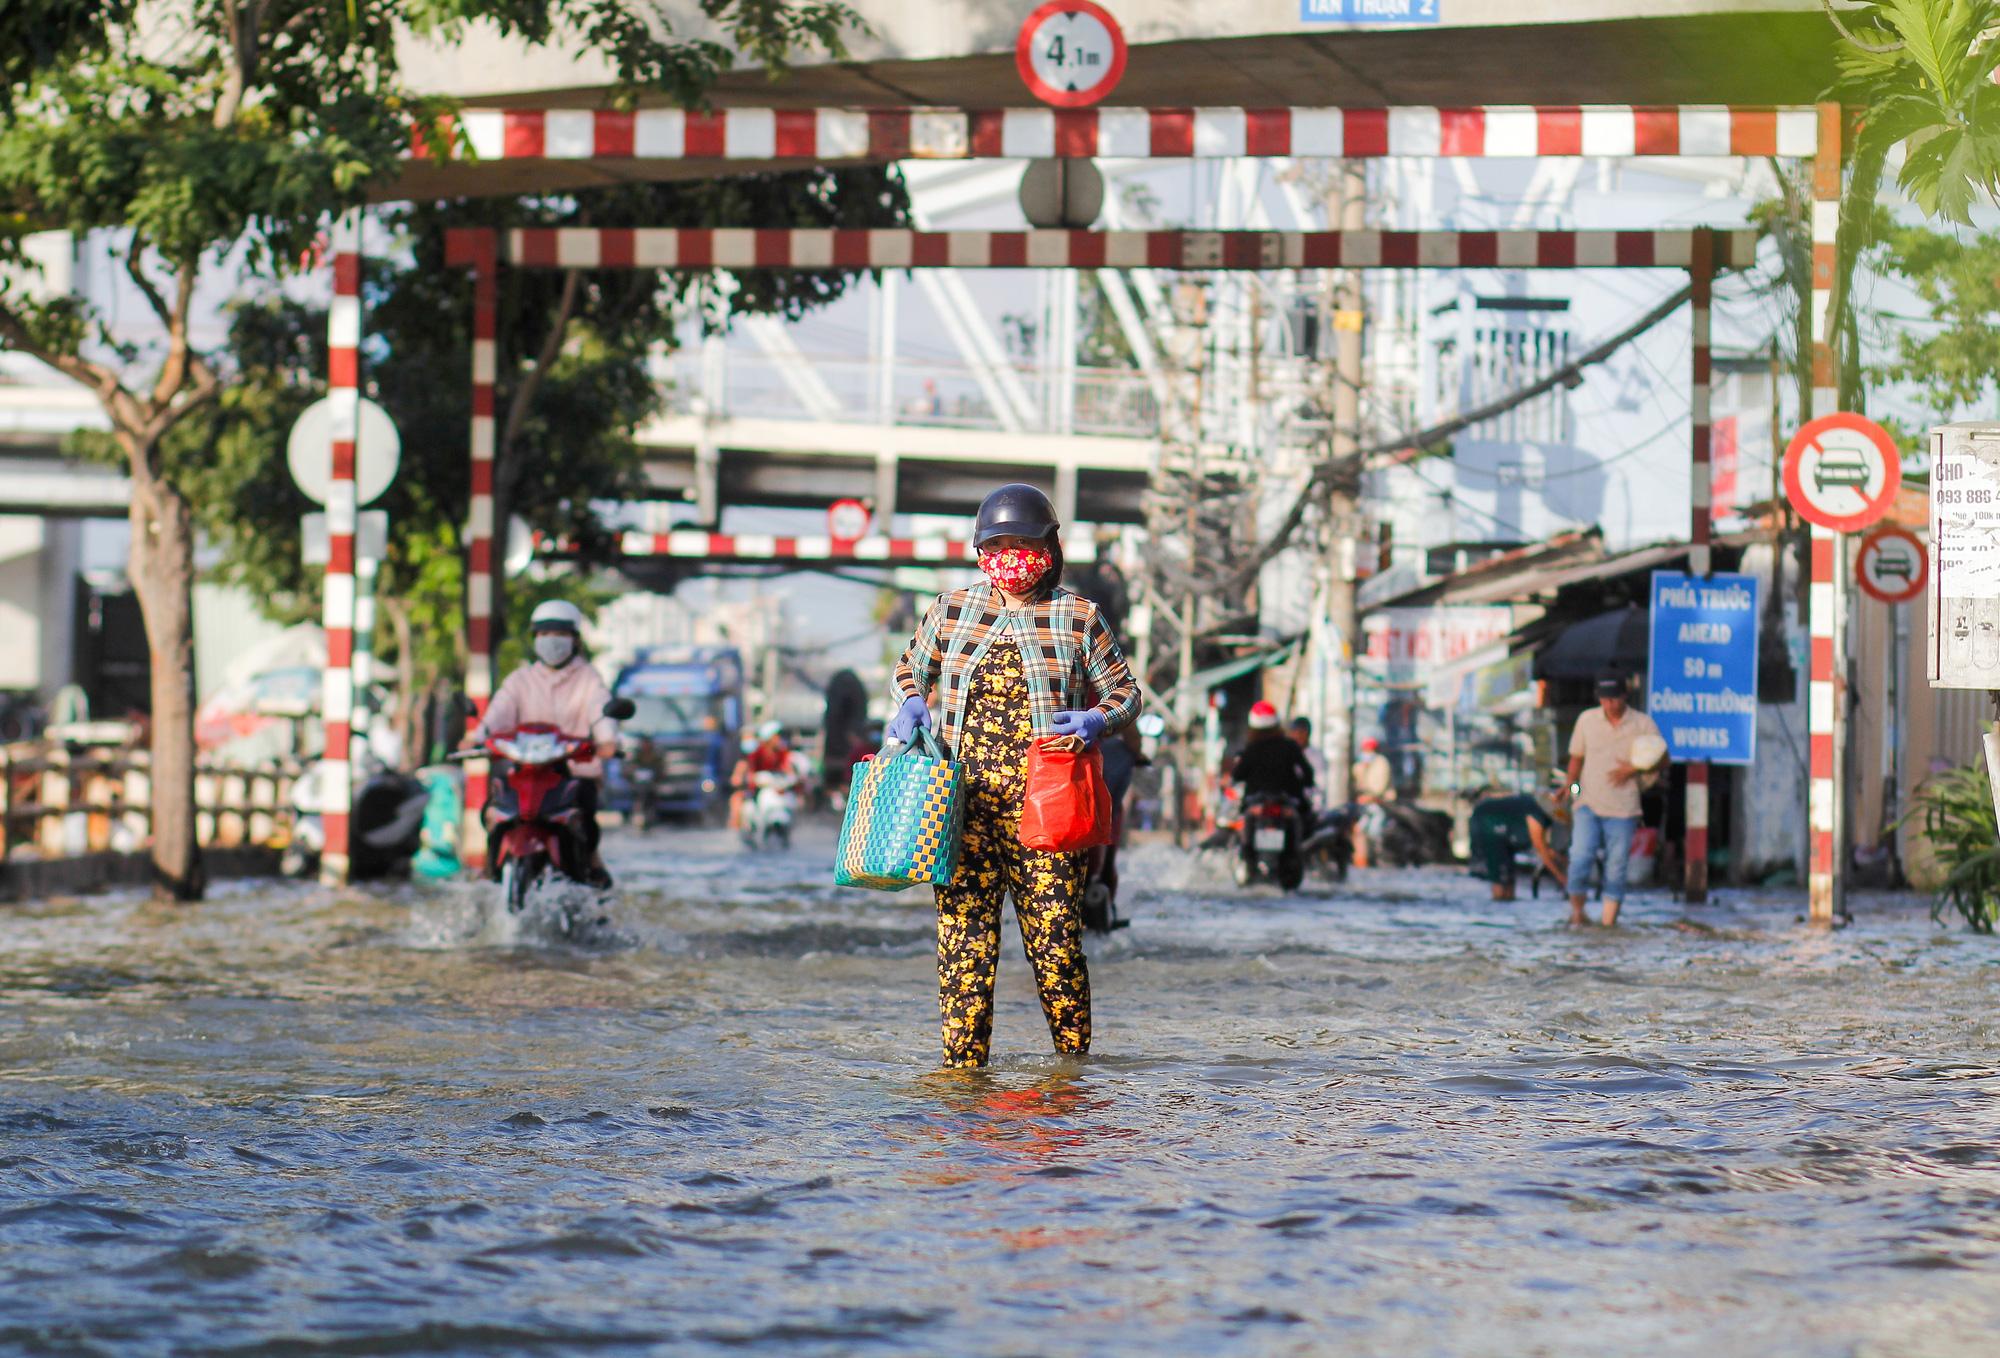 A woman walks on flooded Tran Xuan Soan Street in District 7, Ho Chi Minh City, November 15, 2020. Photo: Chau Tuan / Tuoi Tre